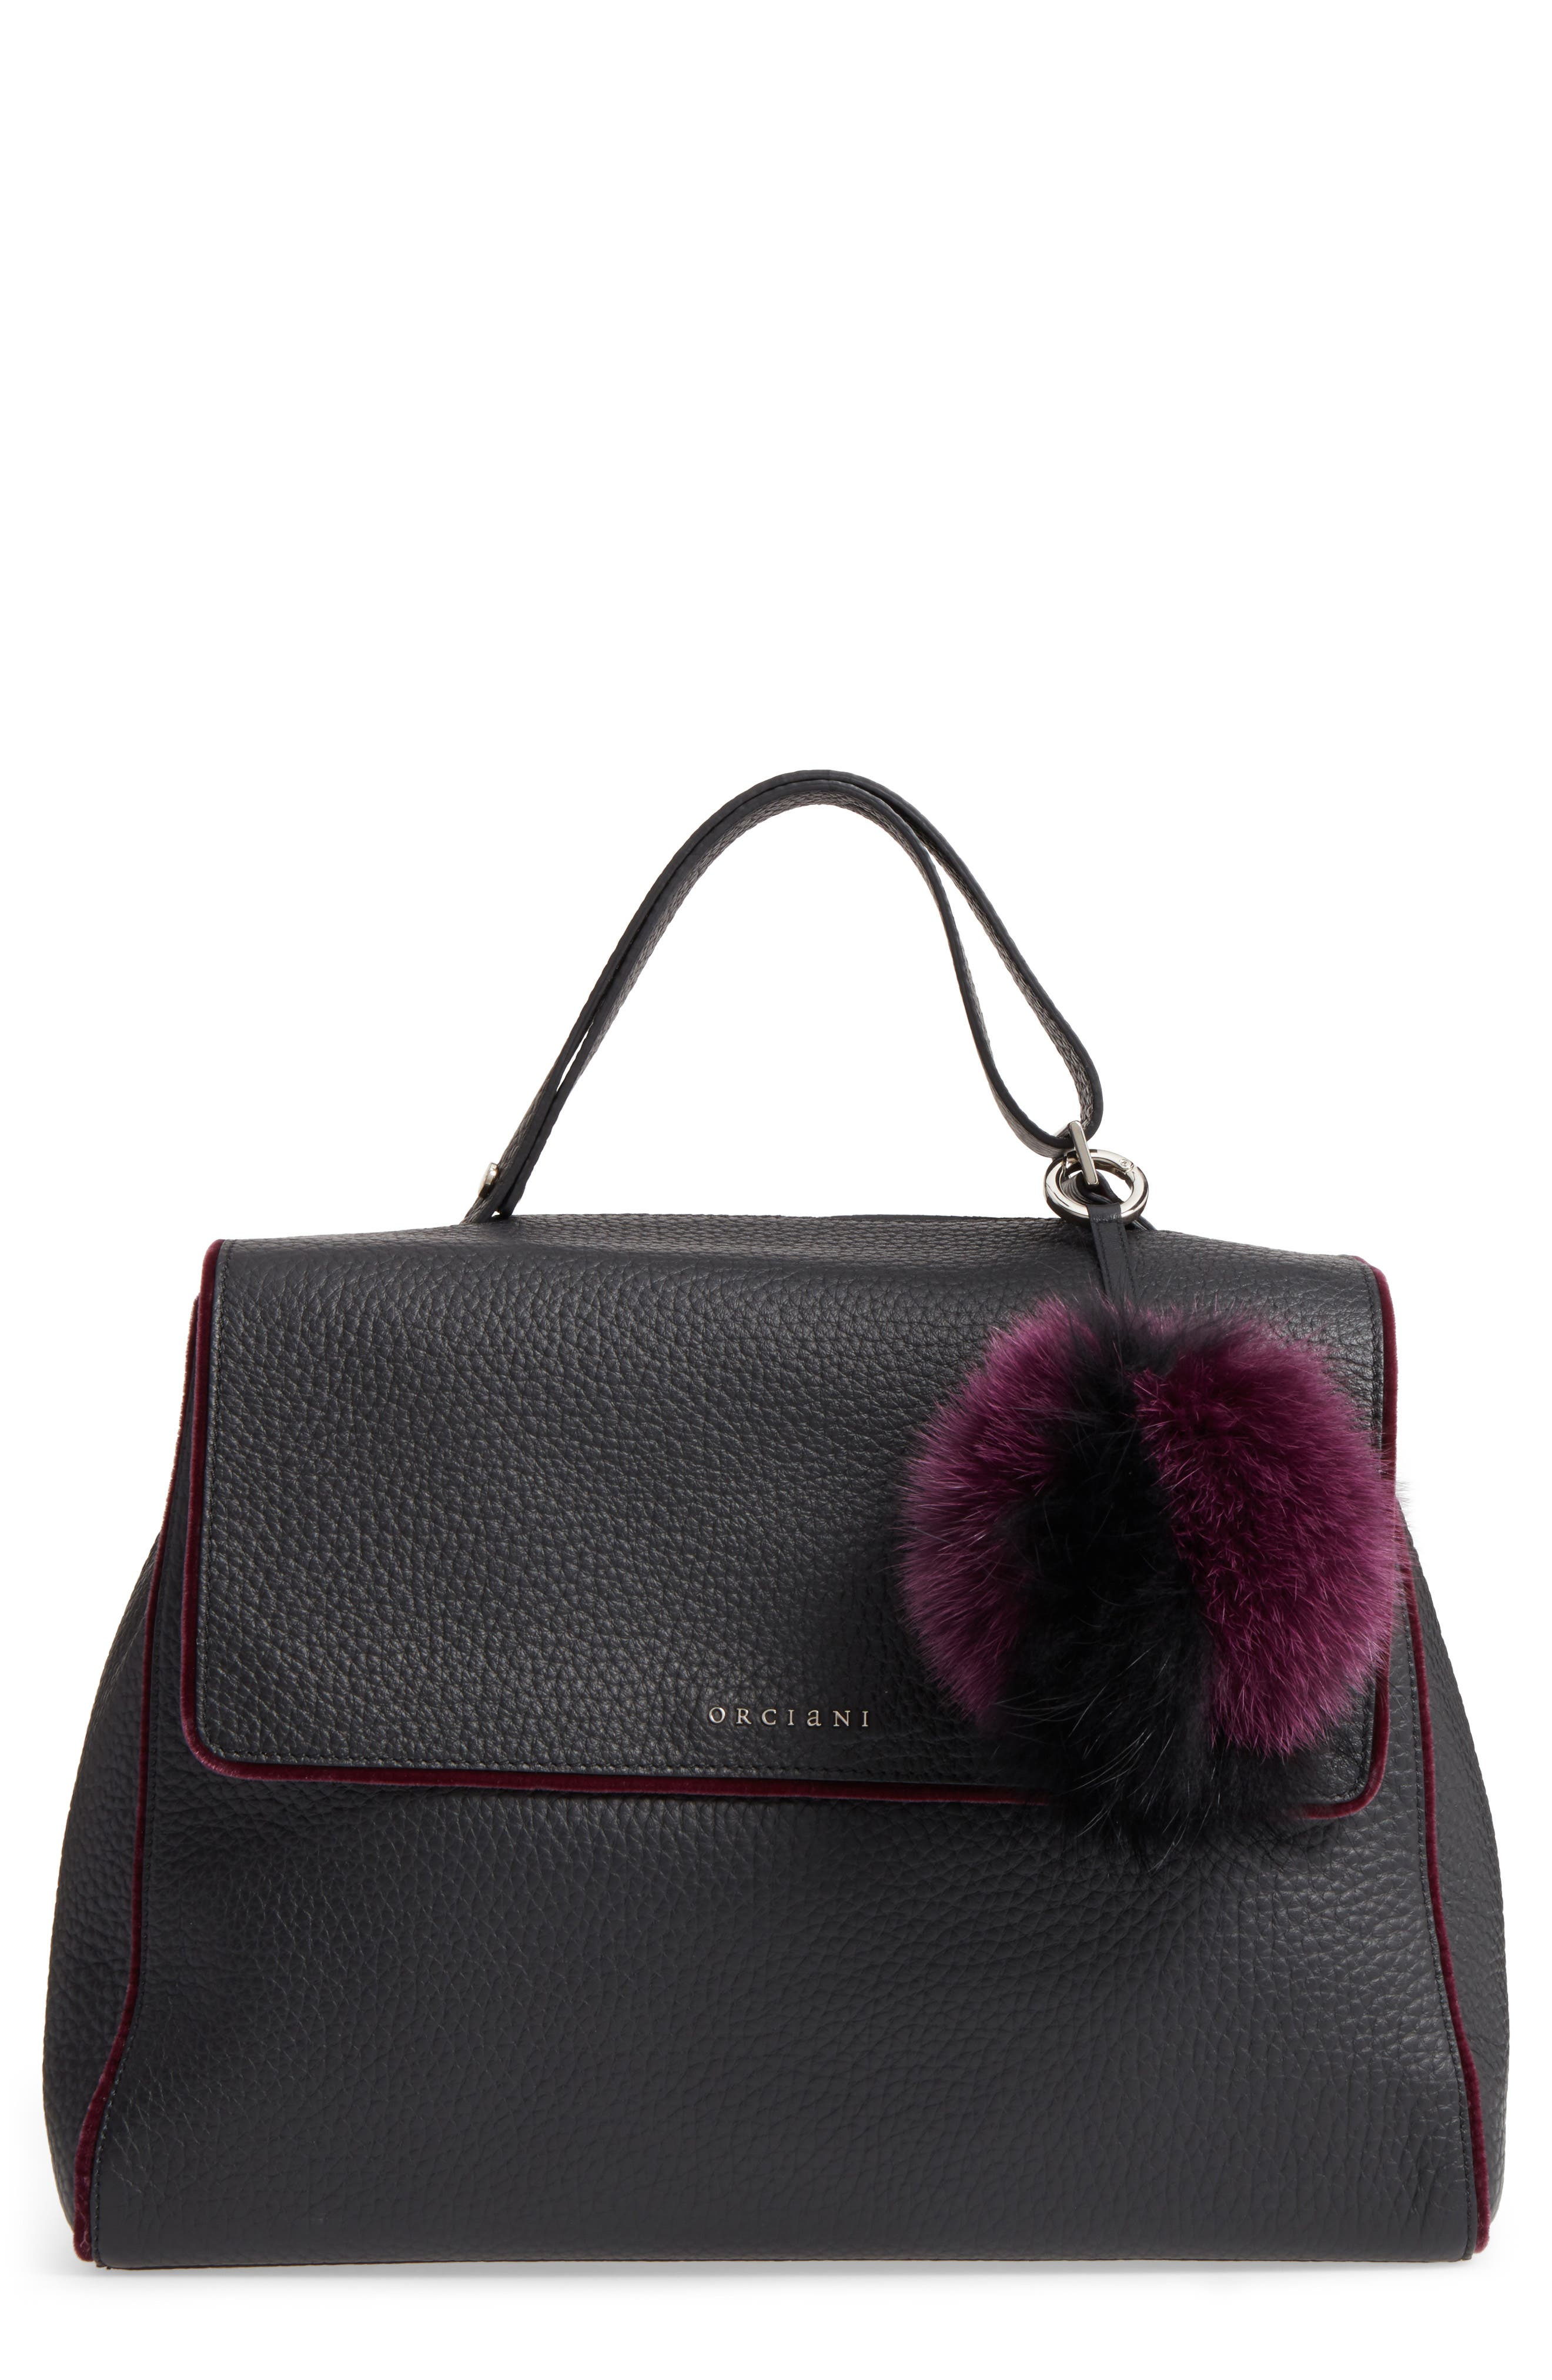 Main Image - Orciani Large Sveva Soft Leather Top Handle Satchel with Genuine Fur Bag Charm